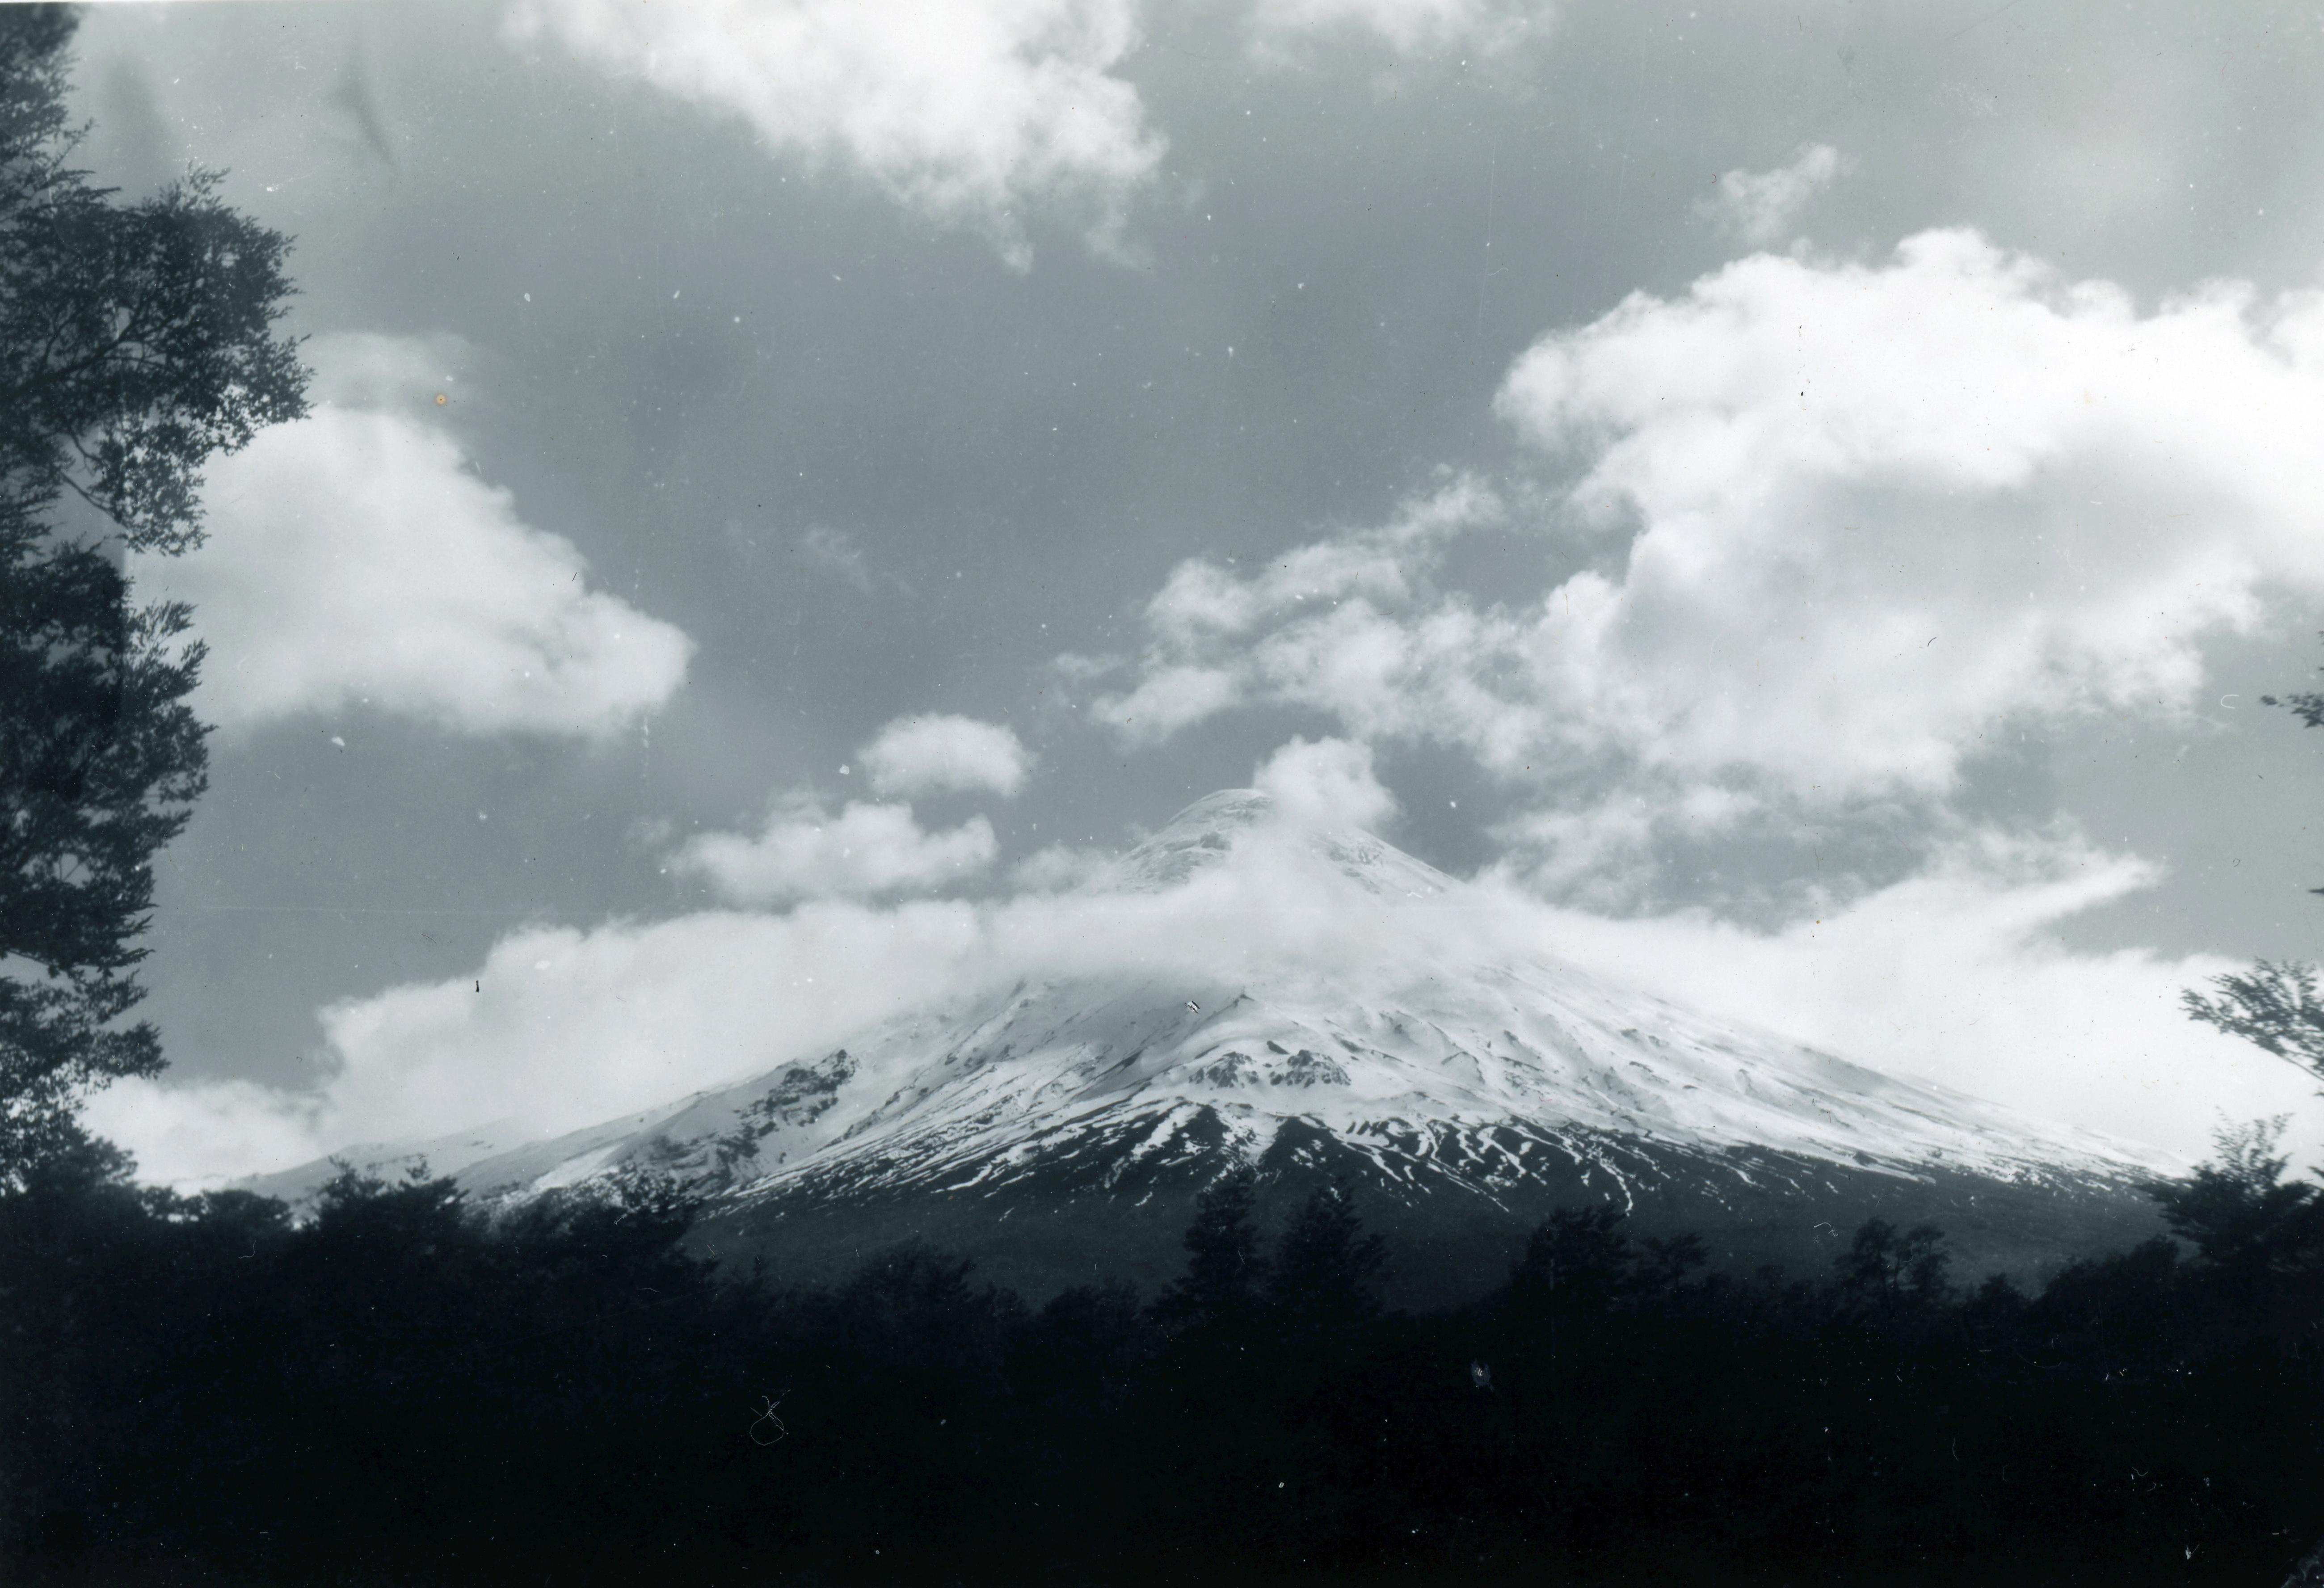 Enterreno - Fotos históricas de chile - fotos antiguas de Chile - Volcán Osorno en 1949